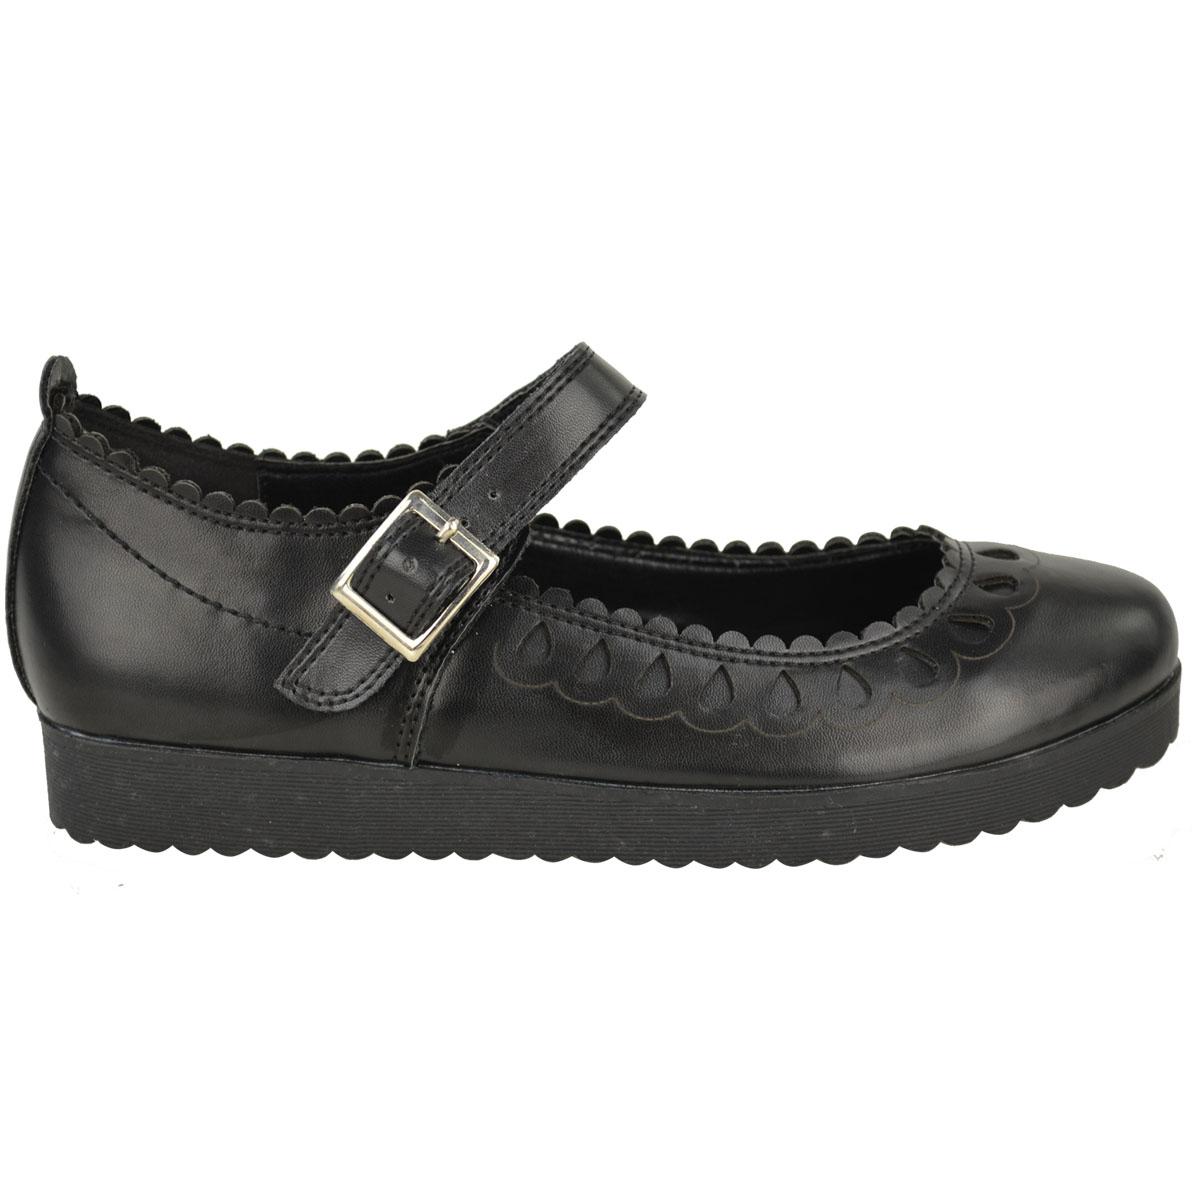 New-Womens-Ladies-Girls-Flats-Shoes-Pumps-School-Work-Office-Geek-Low-Heels-Size thumbnail 7